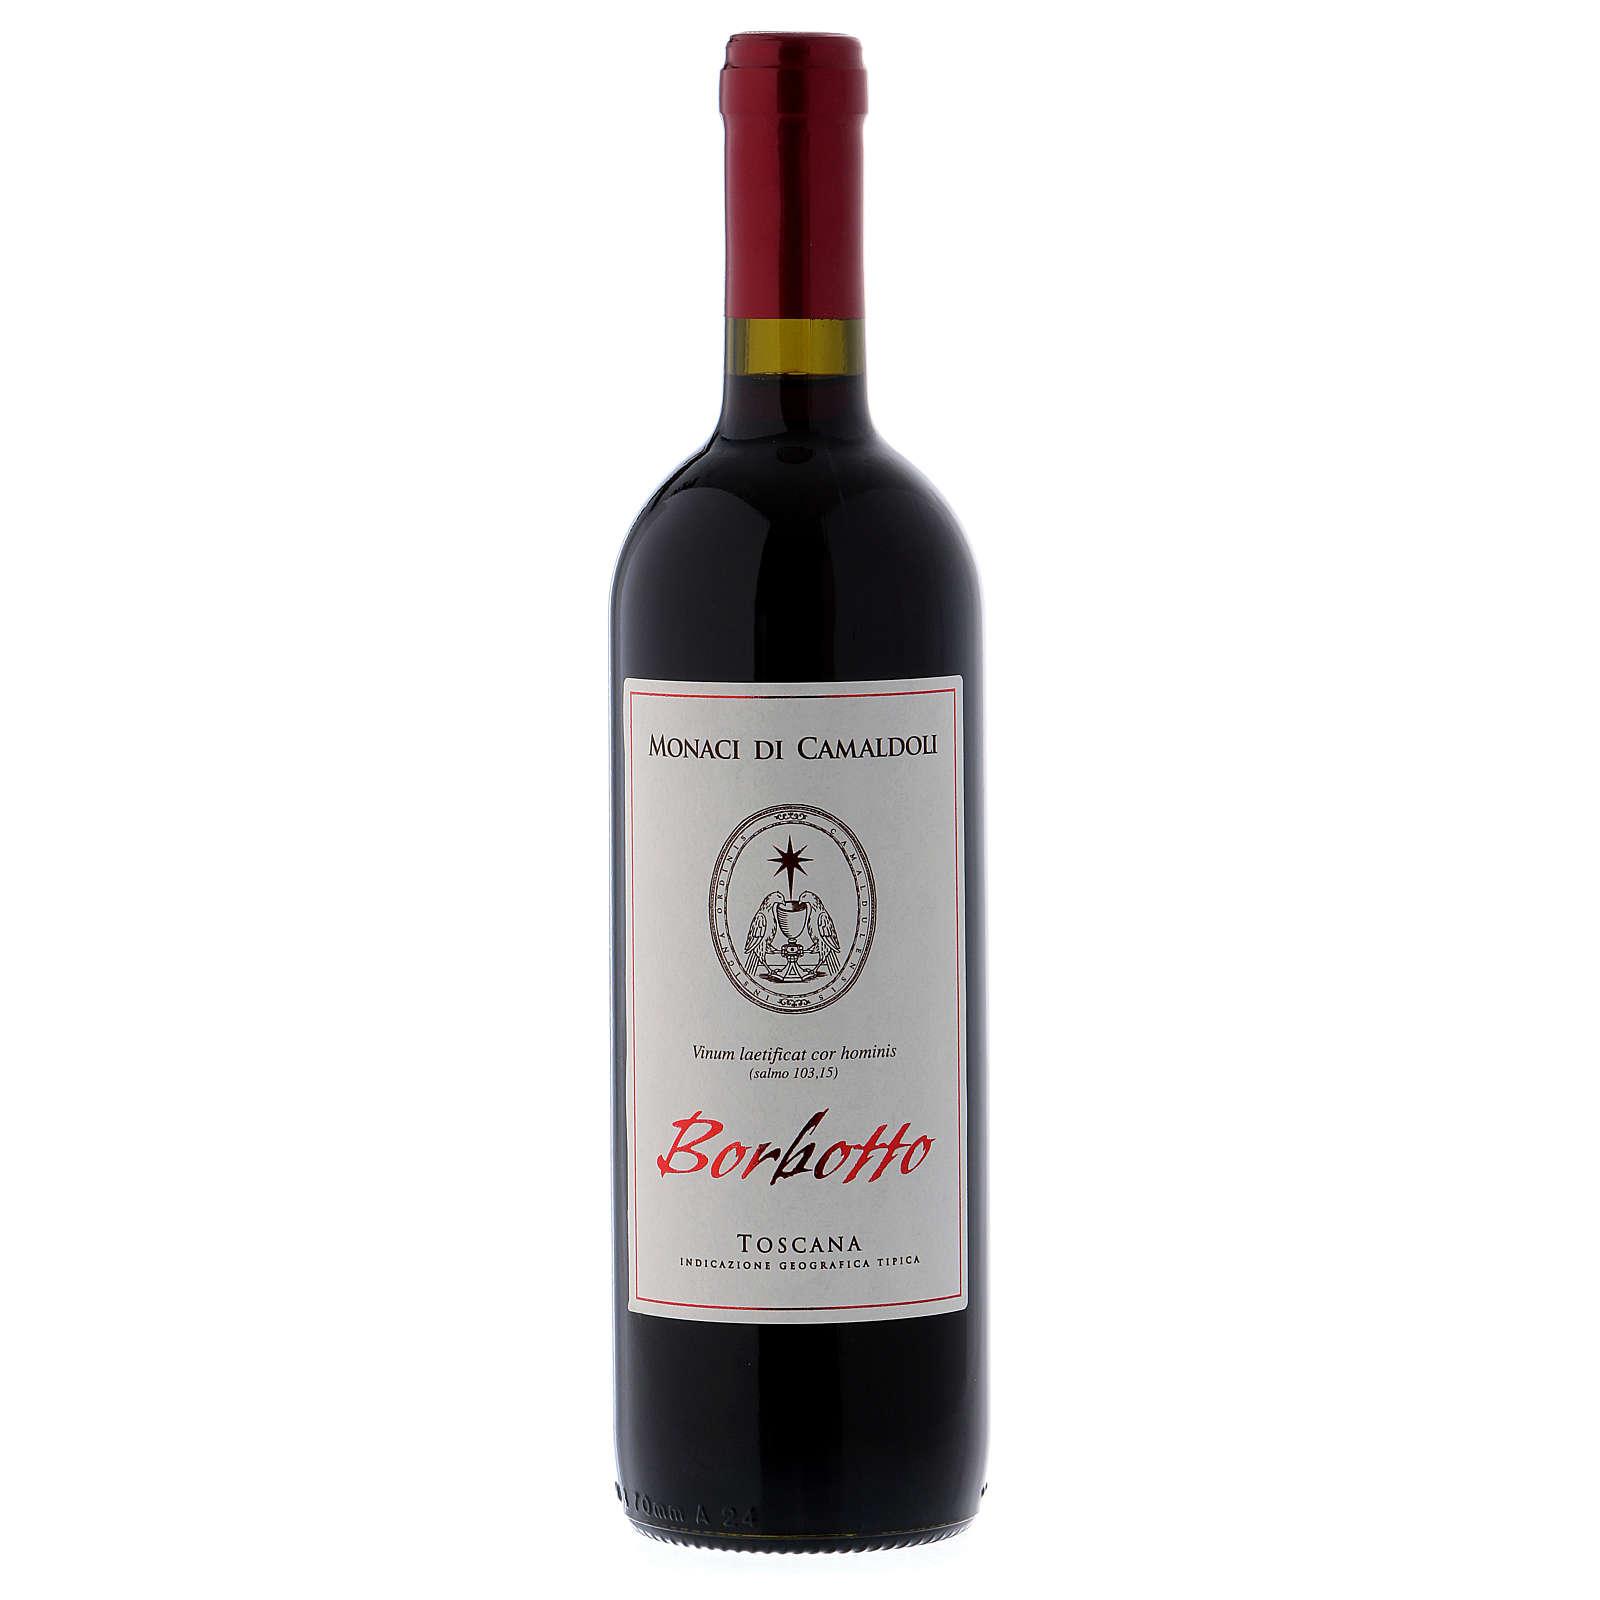 Camaldoli Bordotto red wine from Tuscany 750 ml 2016 3